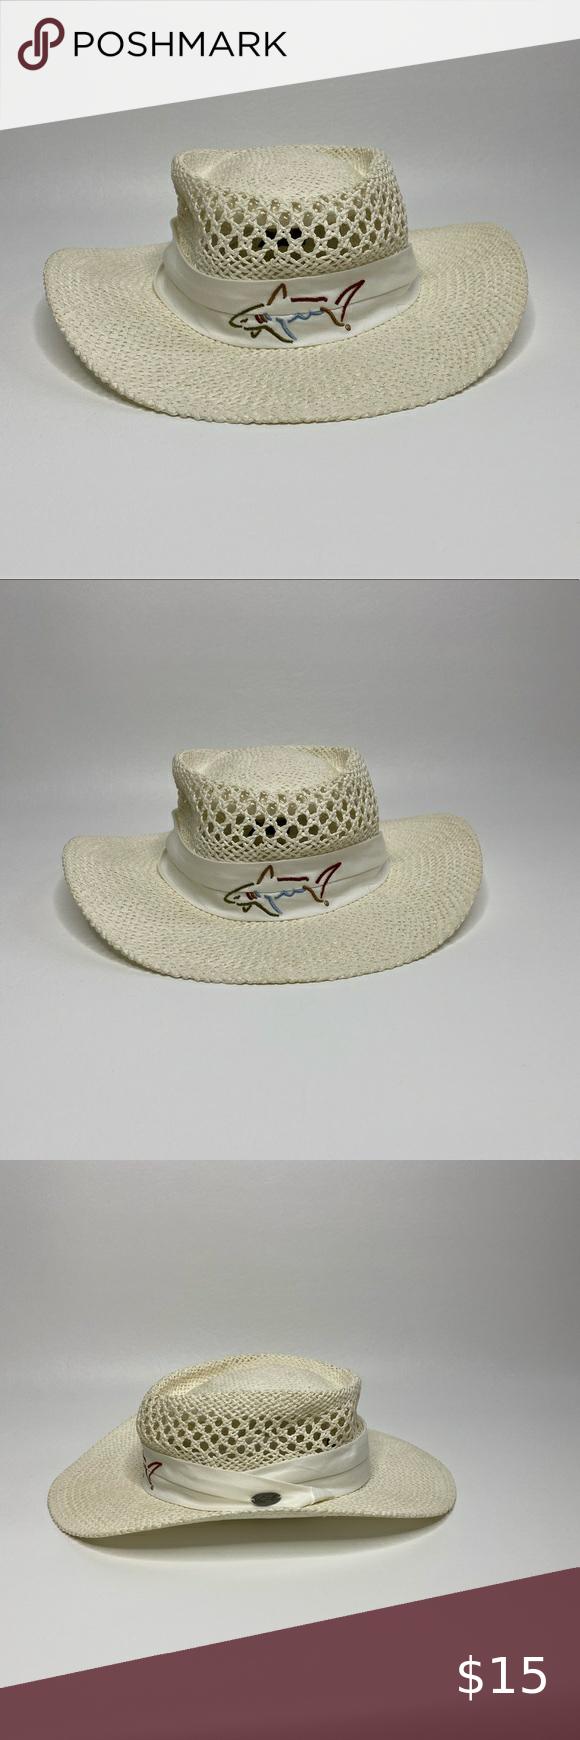 Greg Norman Straw Hat In 2020 Straw Hat Greg Norman Accessories Hats